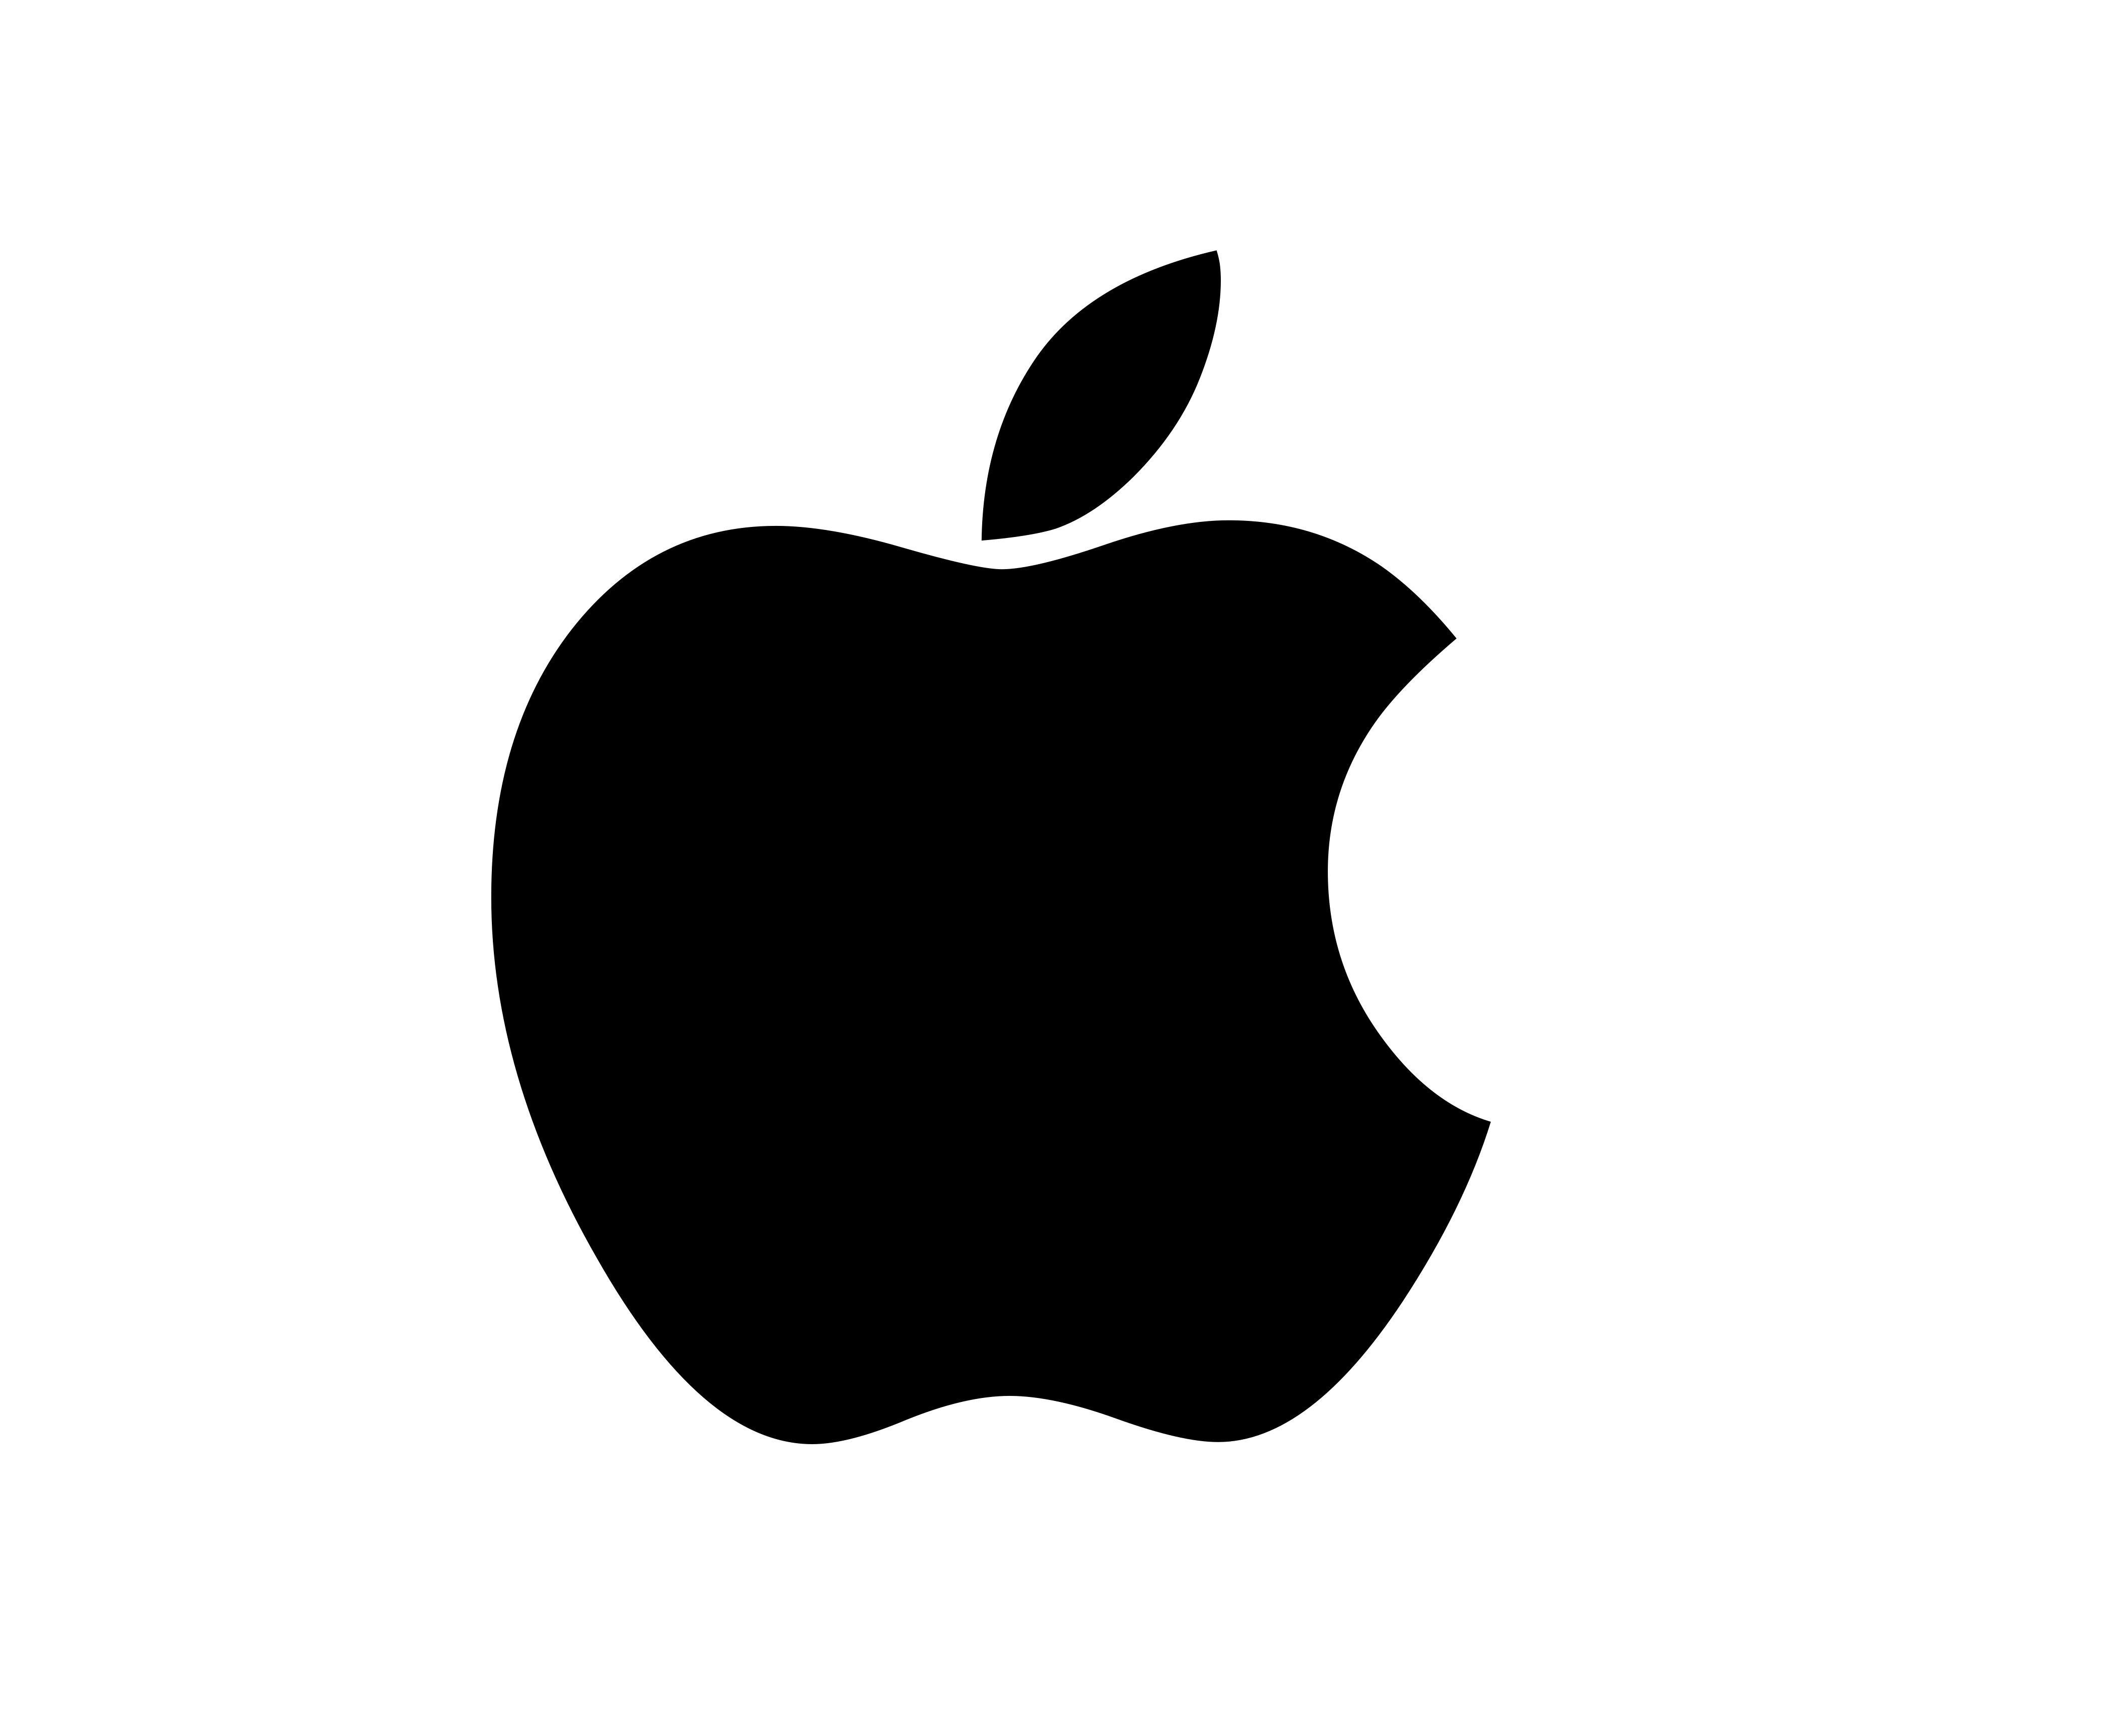 Apple Inc. clipart apple iphone #7